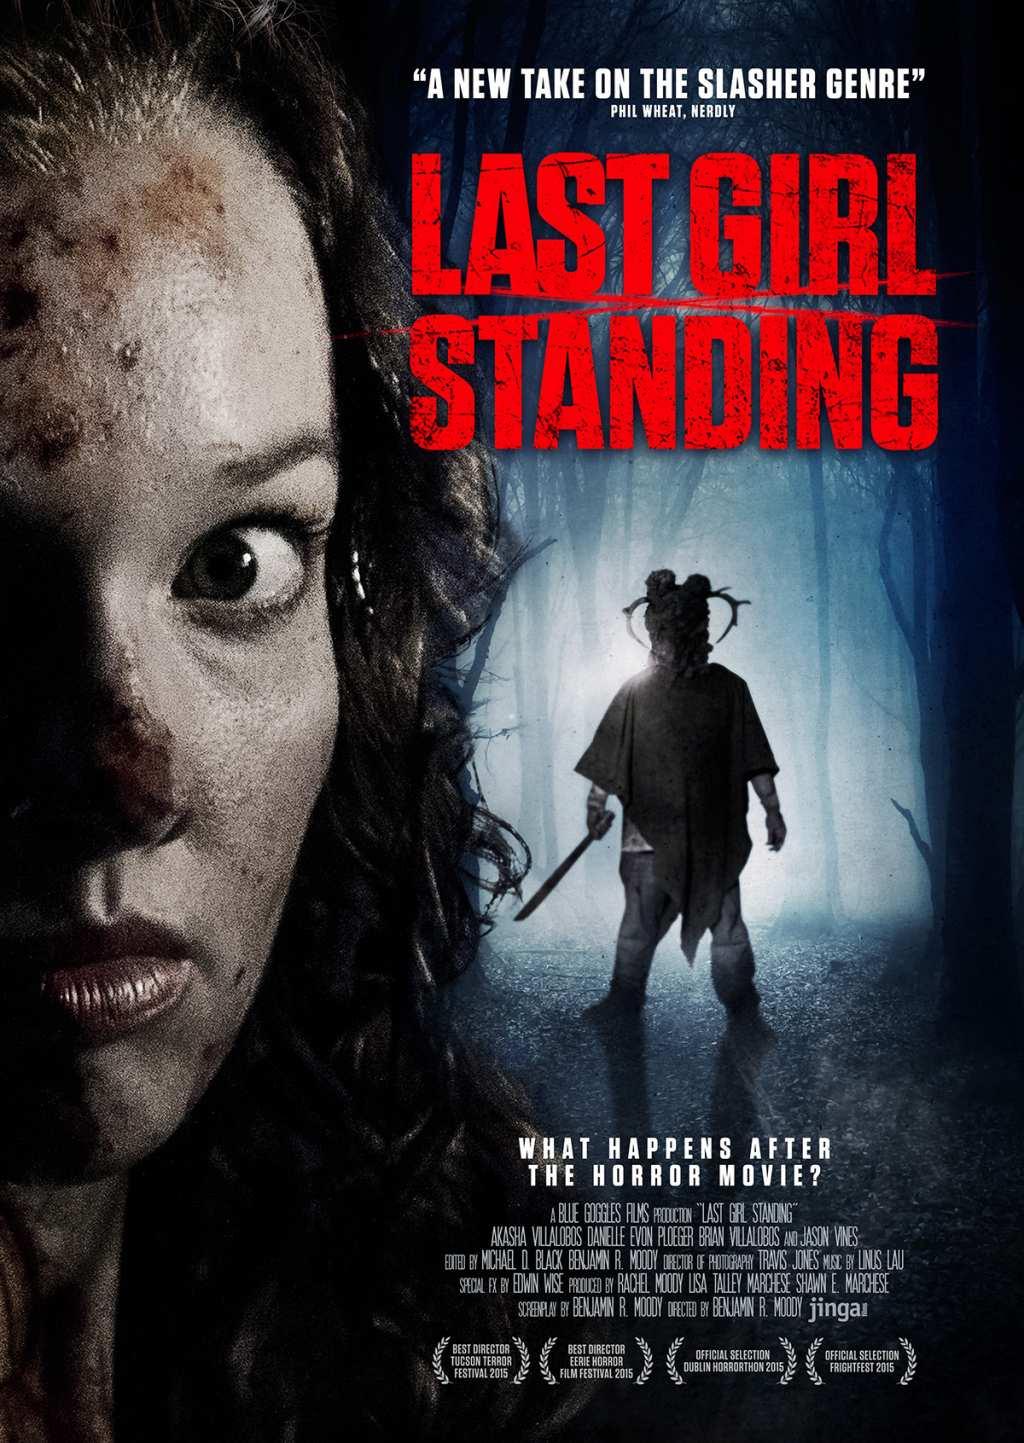 sag kalan last girl standing izle 720p 112